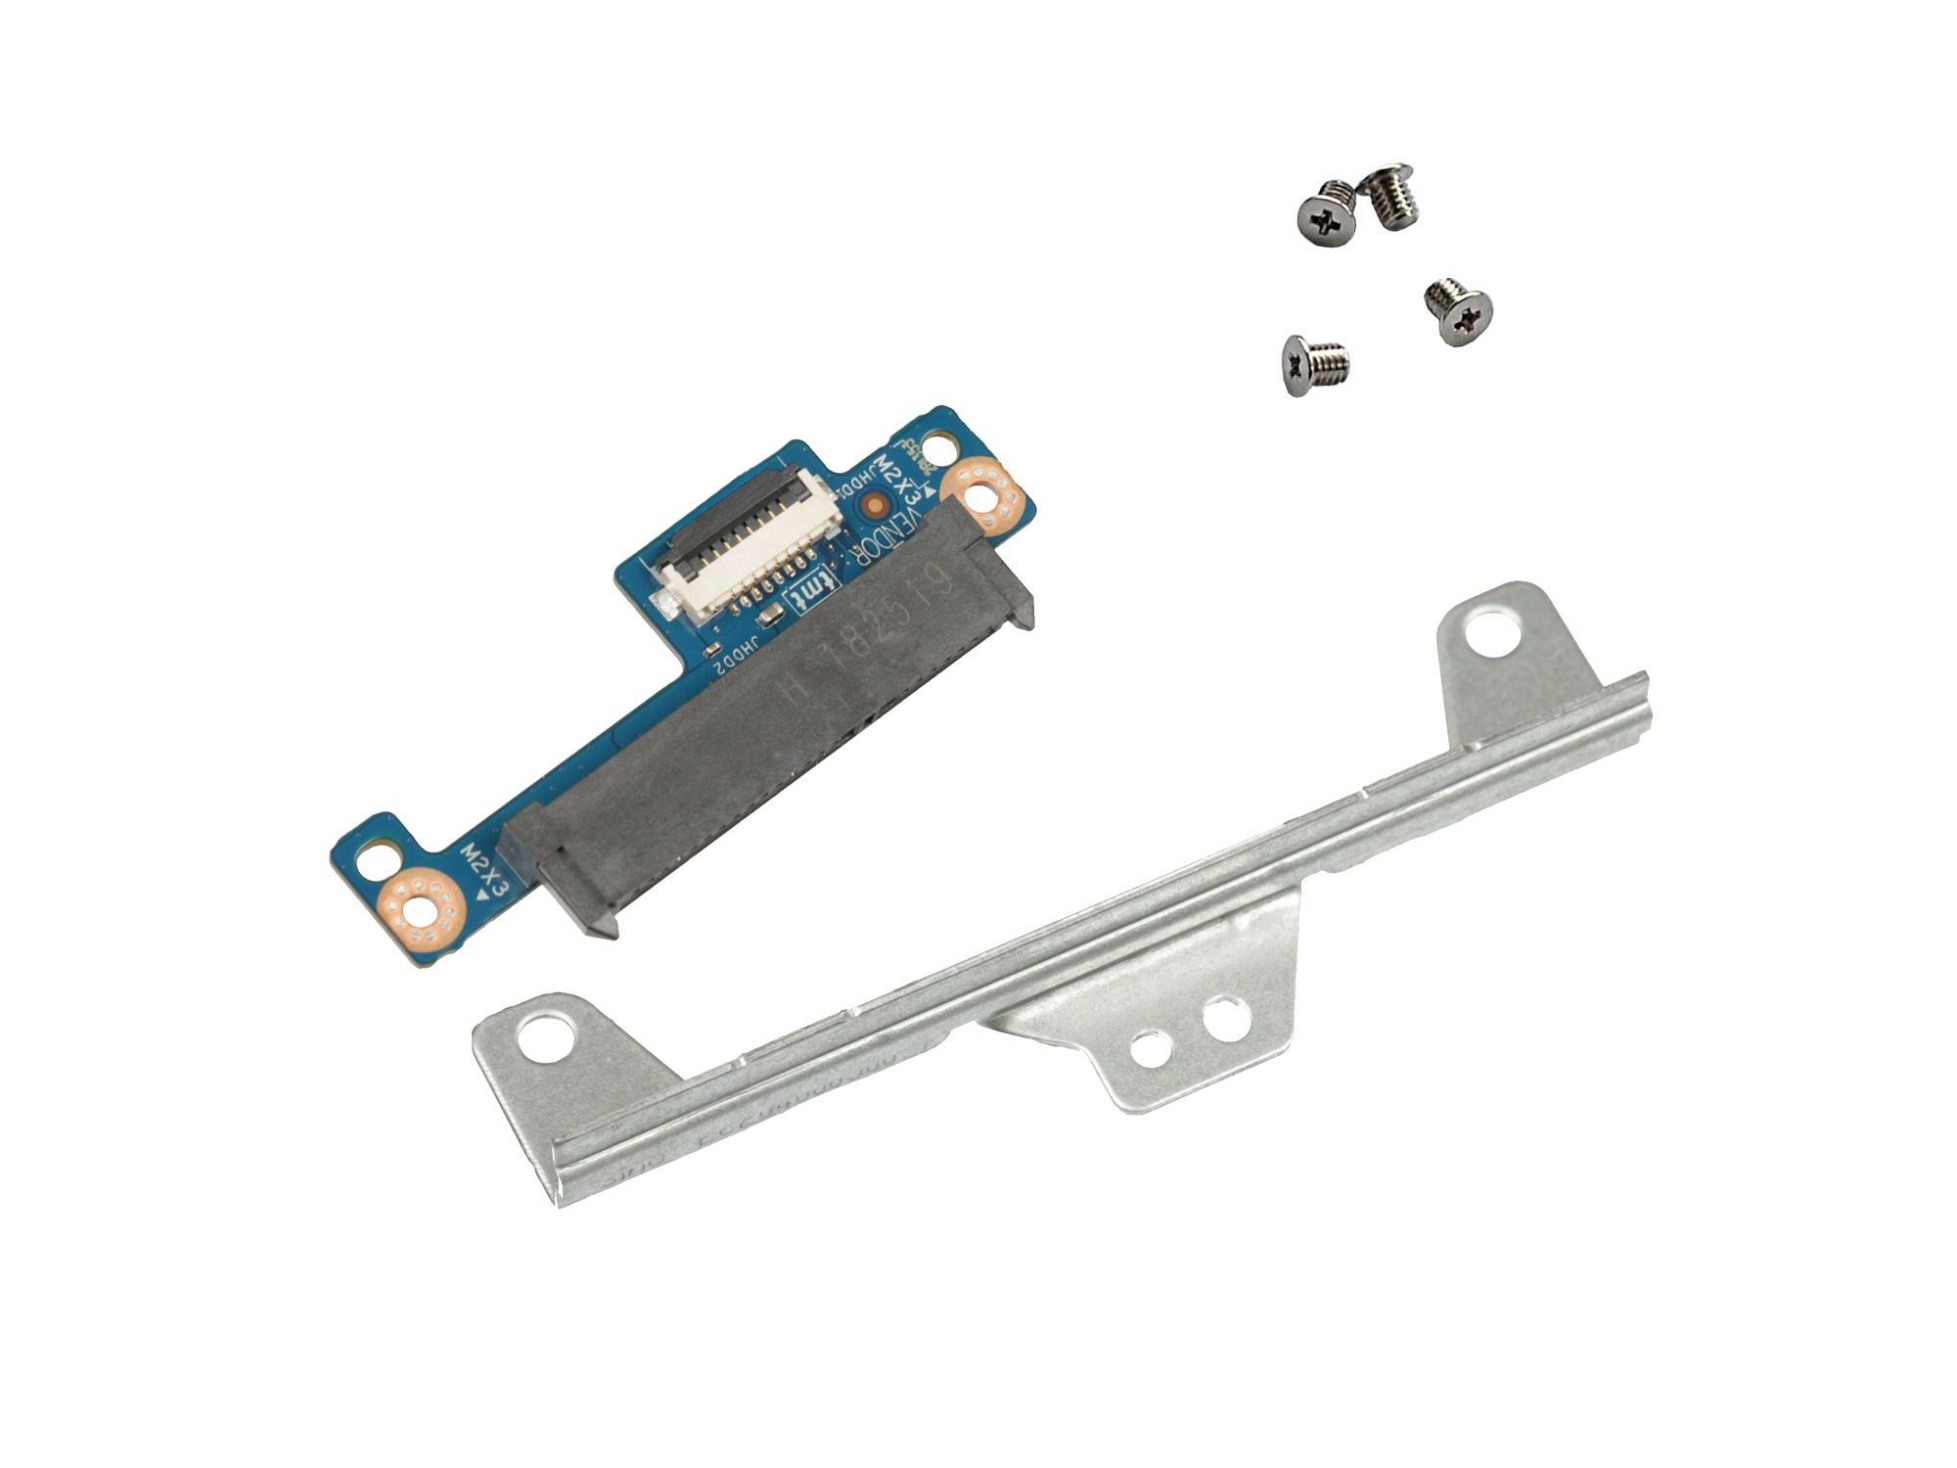 HG15BS HP Festplattenrahmen/Adapter inkl. HDD Schrauben